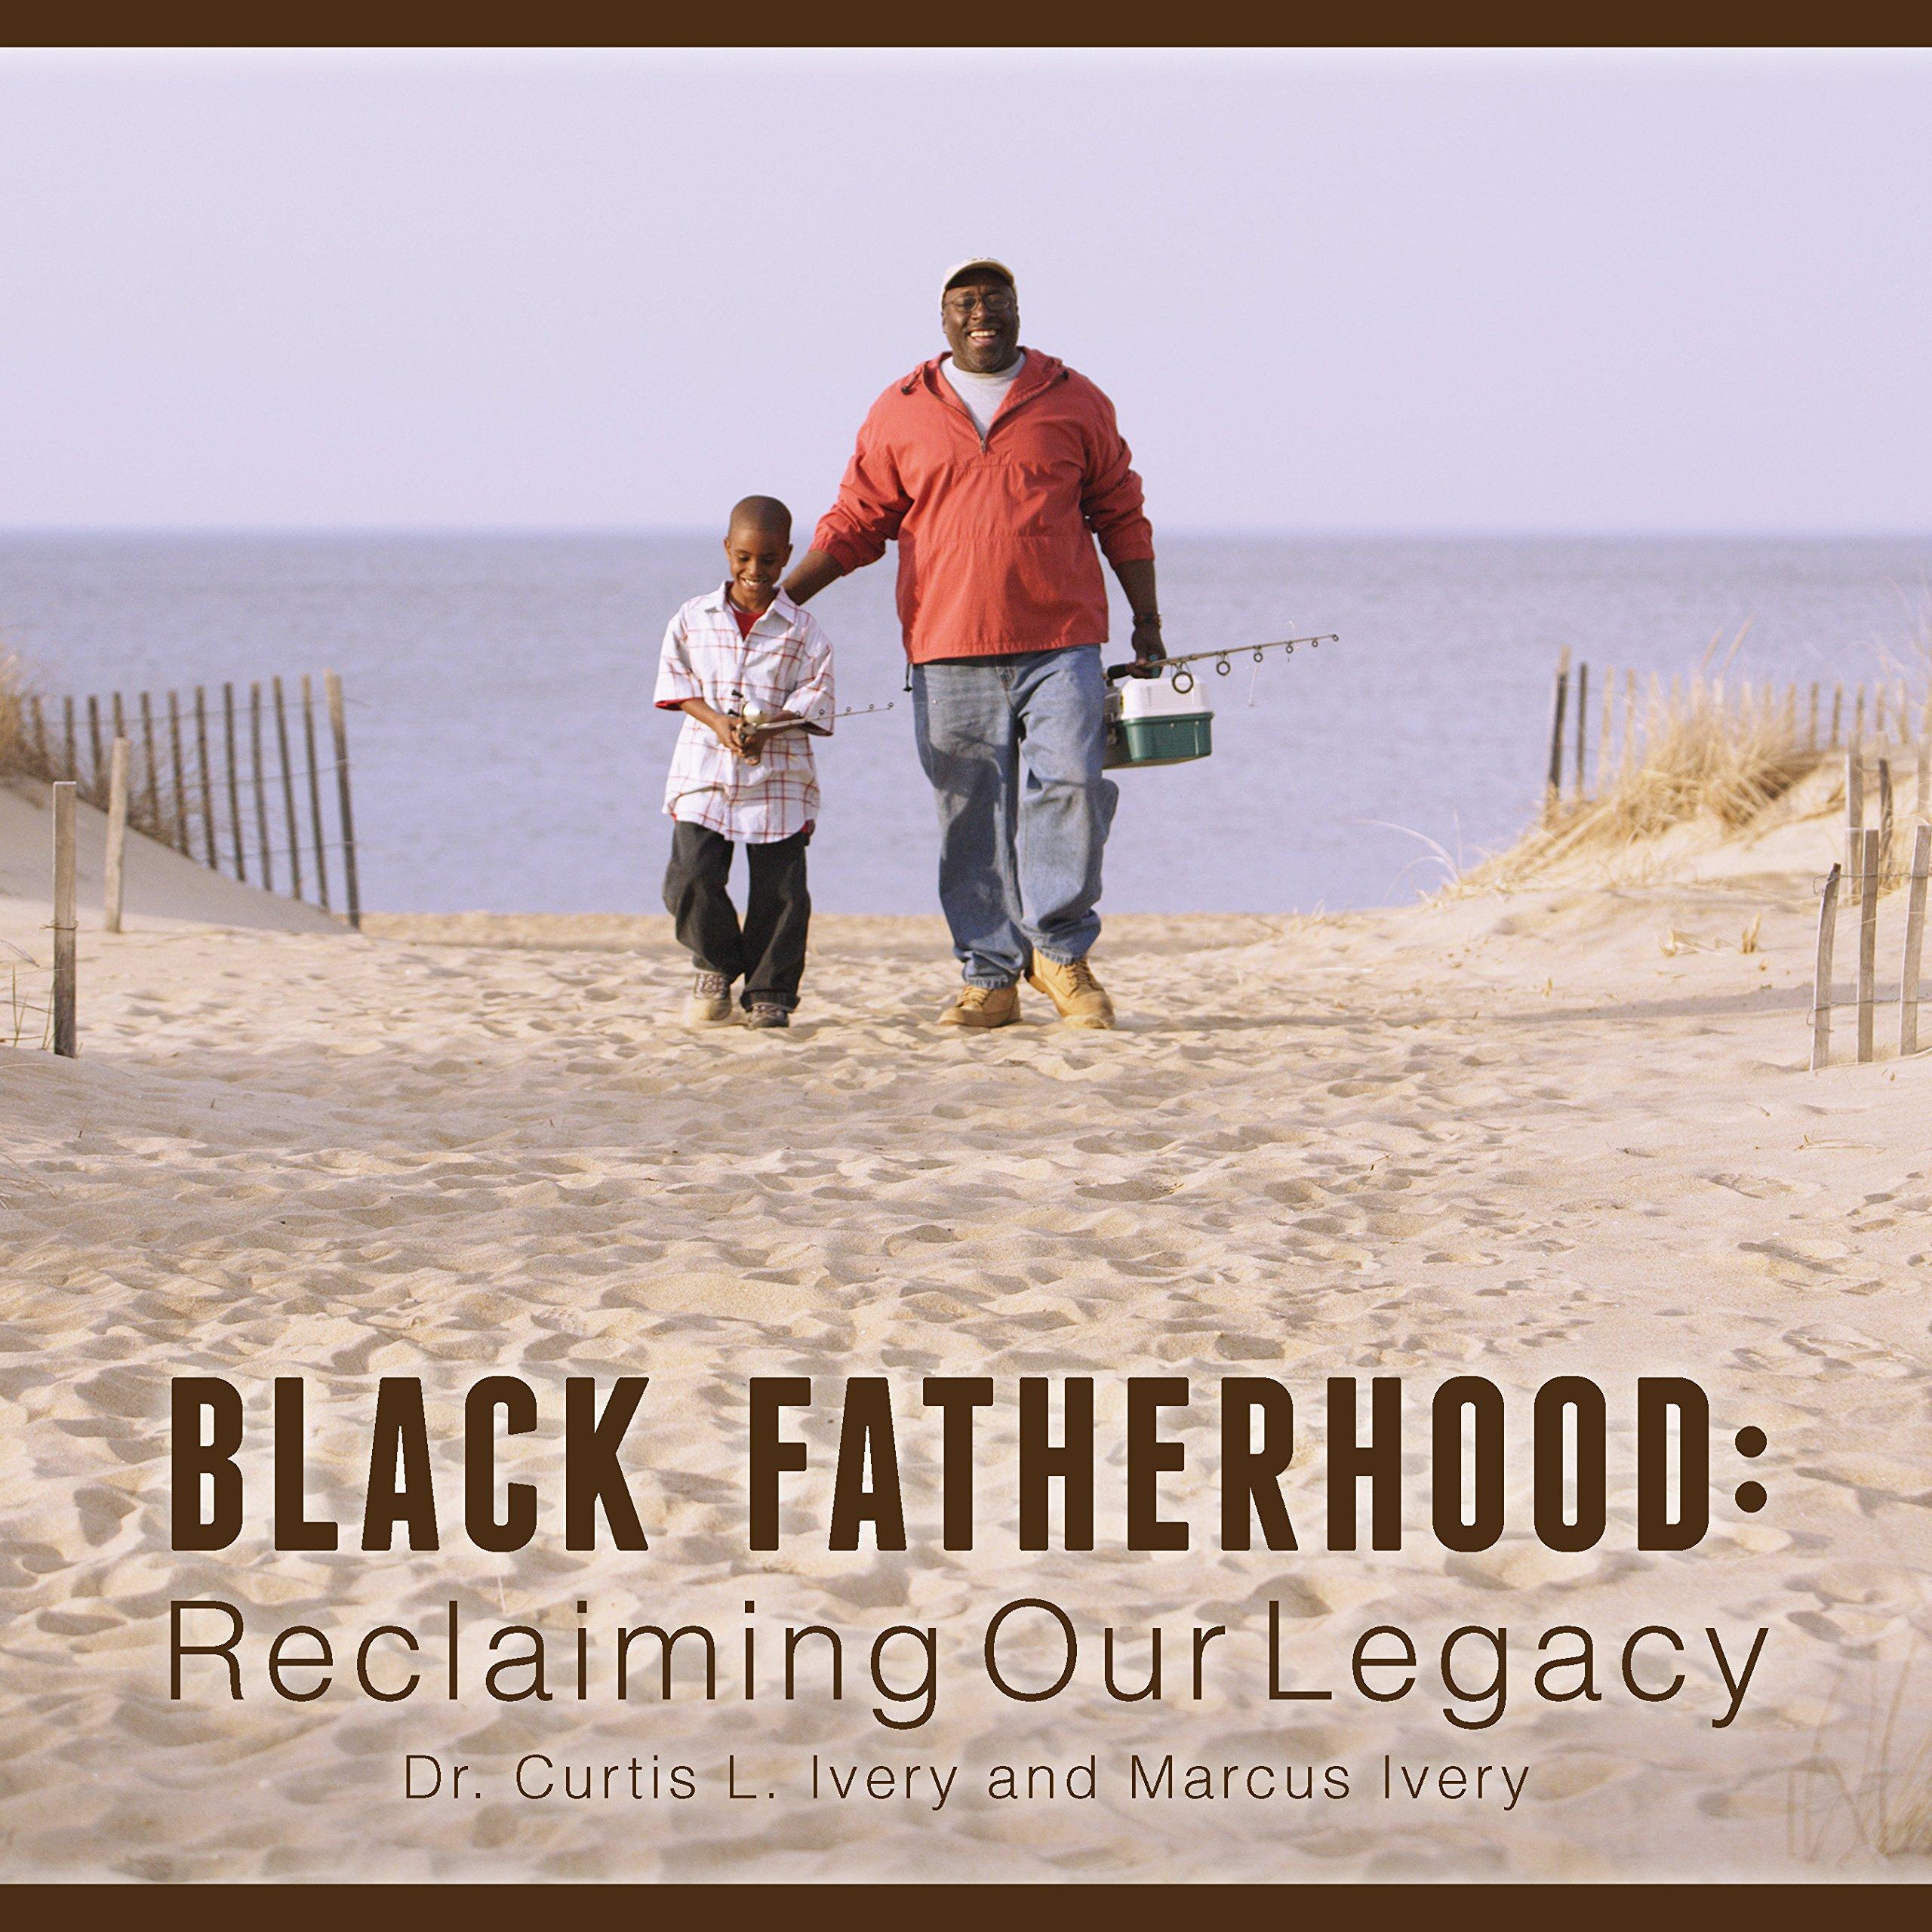 Black Fatherhood: Reclaiming Our Legacy Hardcover – November 3, 2014